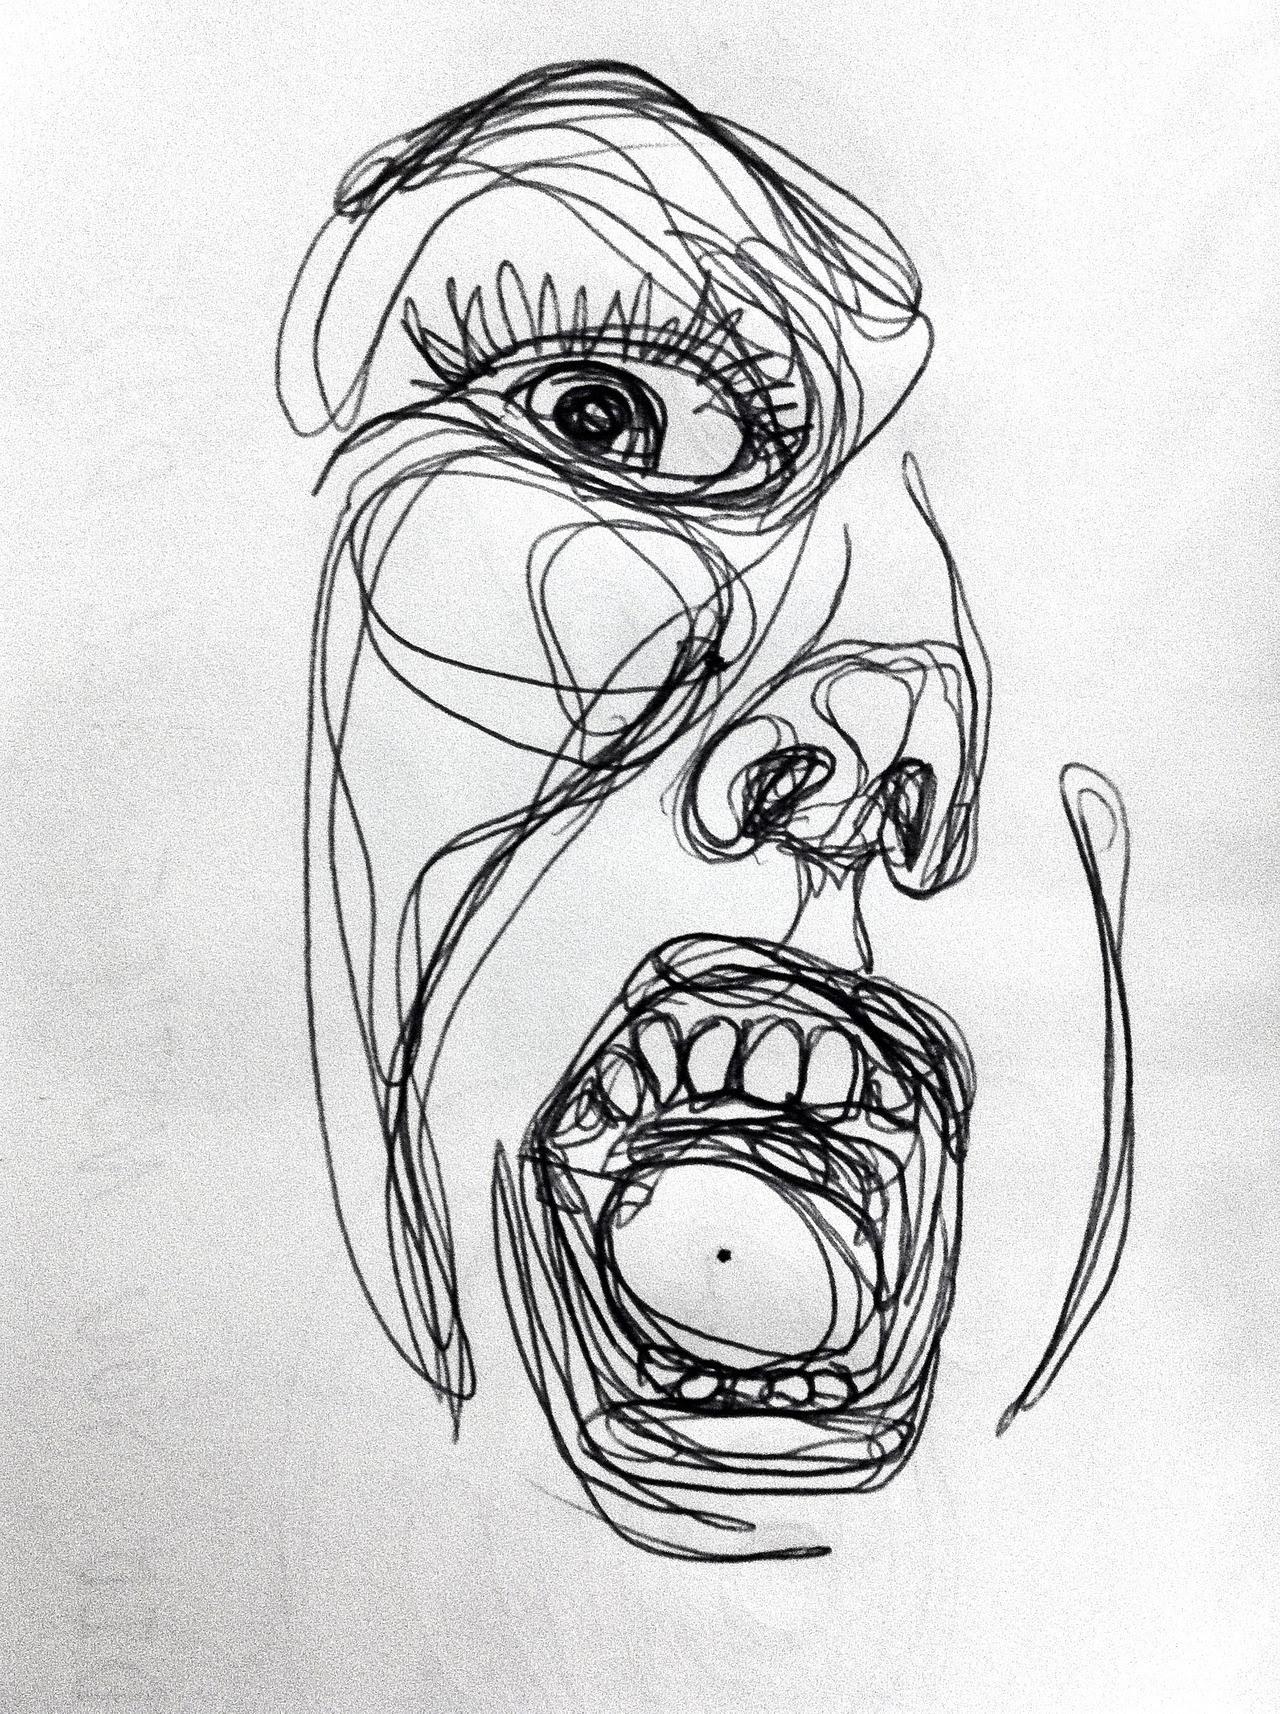 Trippy Pencil Drawings Tumblr